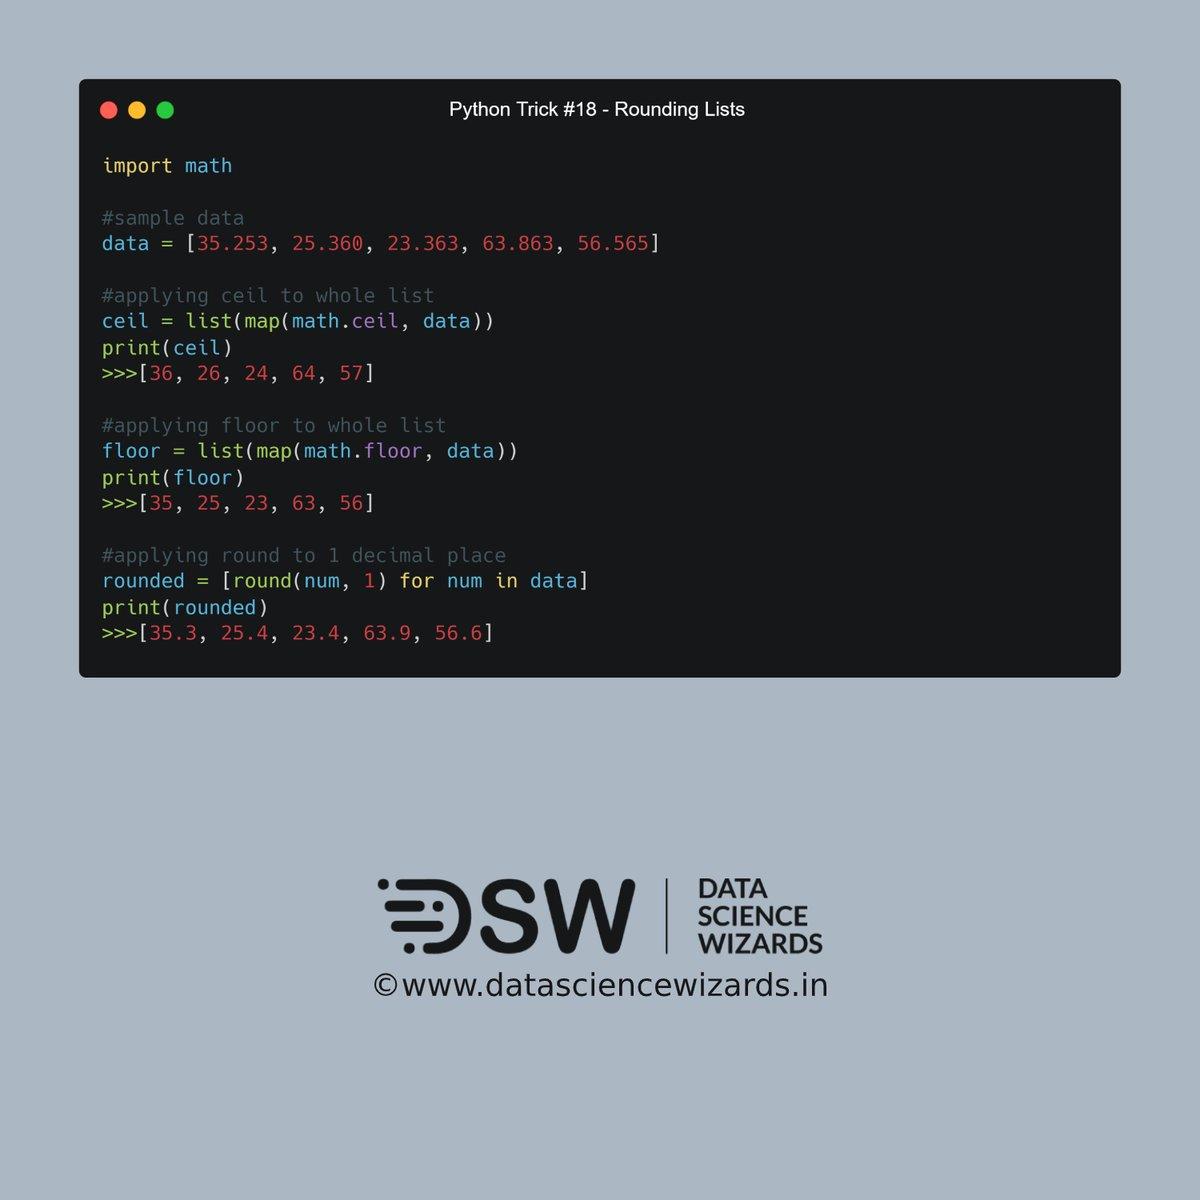 Python Trick #18 - Rounding Lists  1/4  #ArtificialInteligence #MachineLearning #DeepLearning #DataScience #NeuralNetworks #Data #AI #ML #DL #DSW #DataScienceWizards #Python #PythonTrickspic.twitter.com/WE15yvz9XB